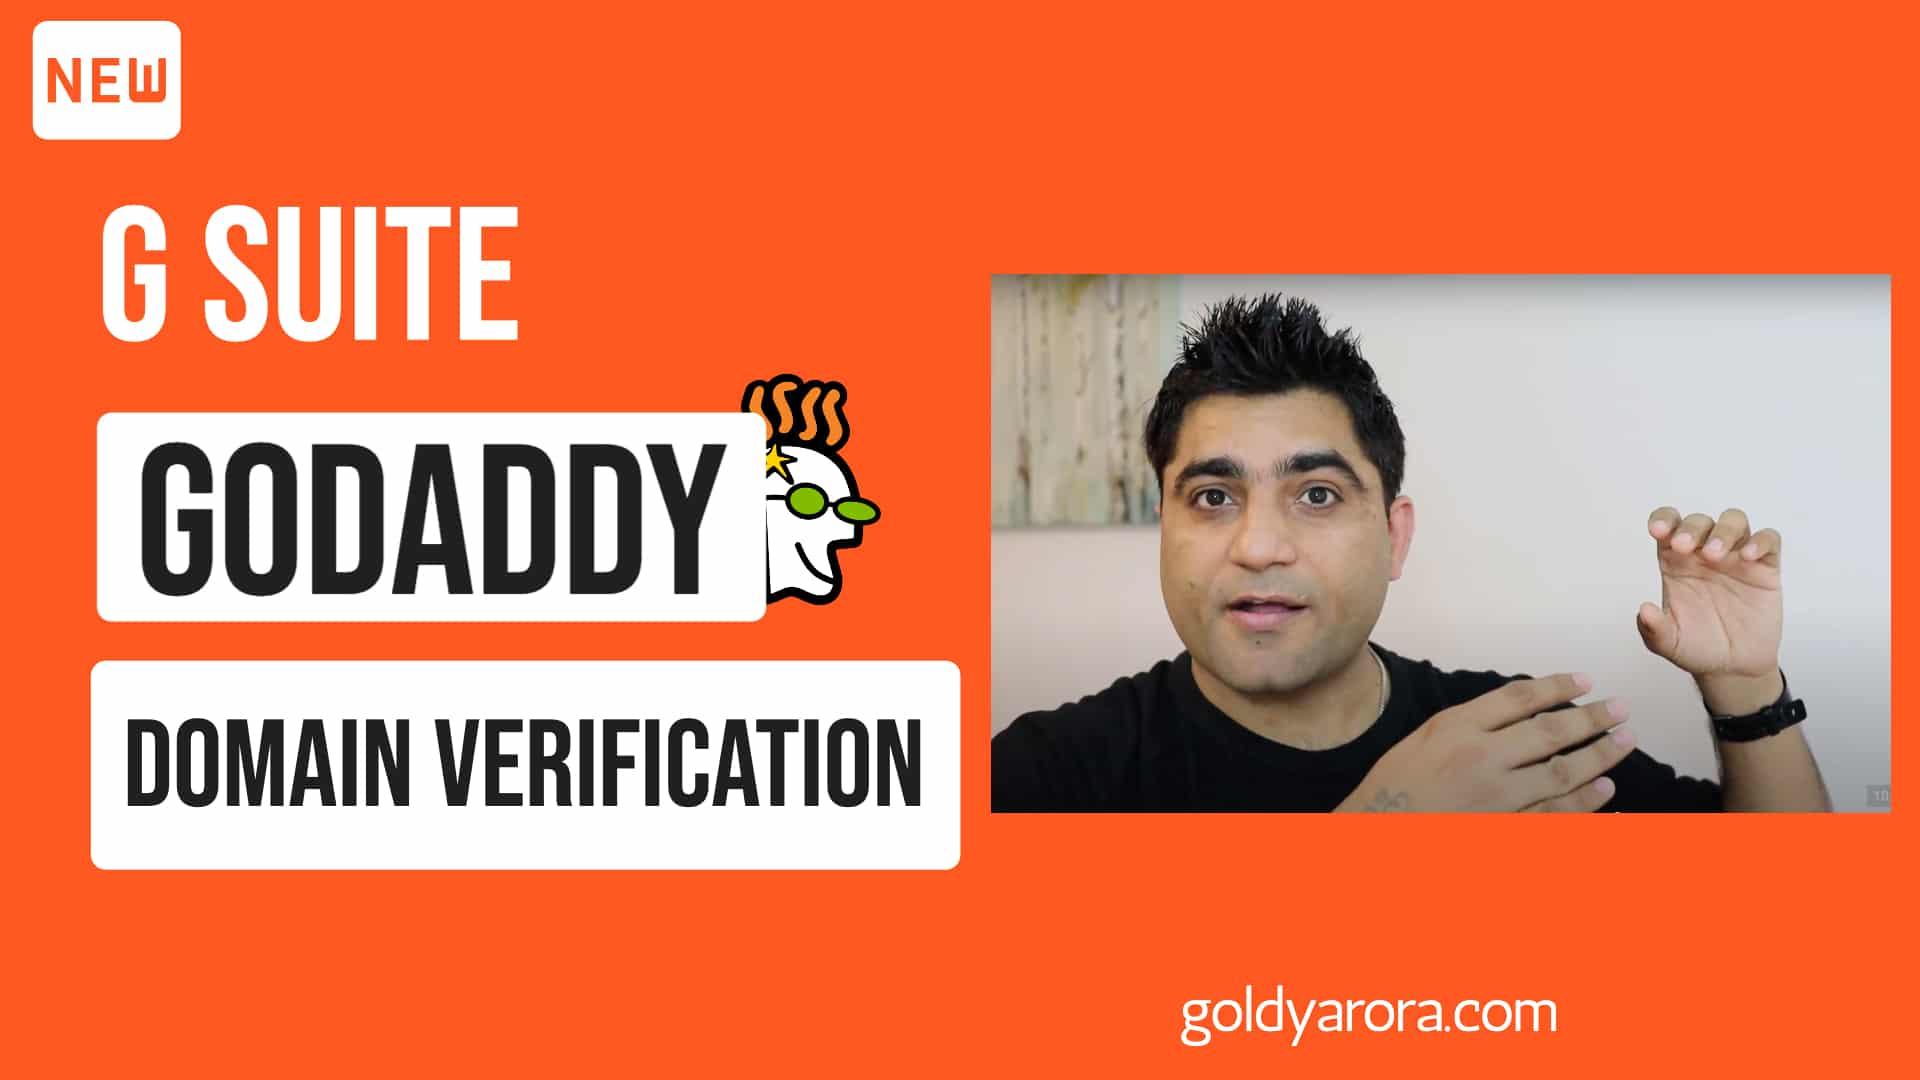 Google Workspace Godaddy Setup - Domain Verification